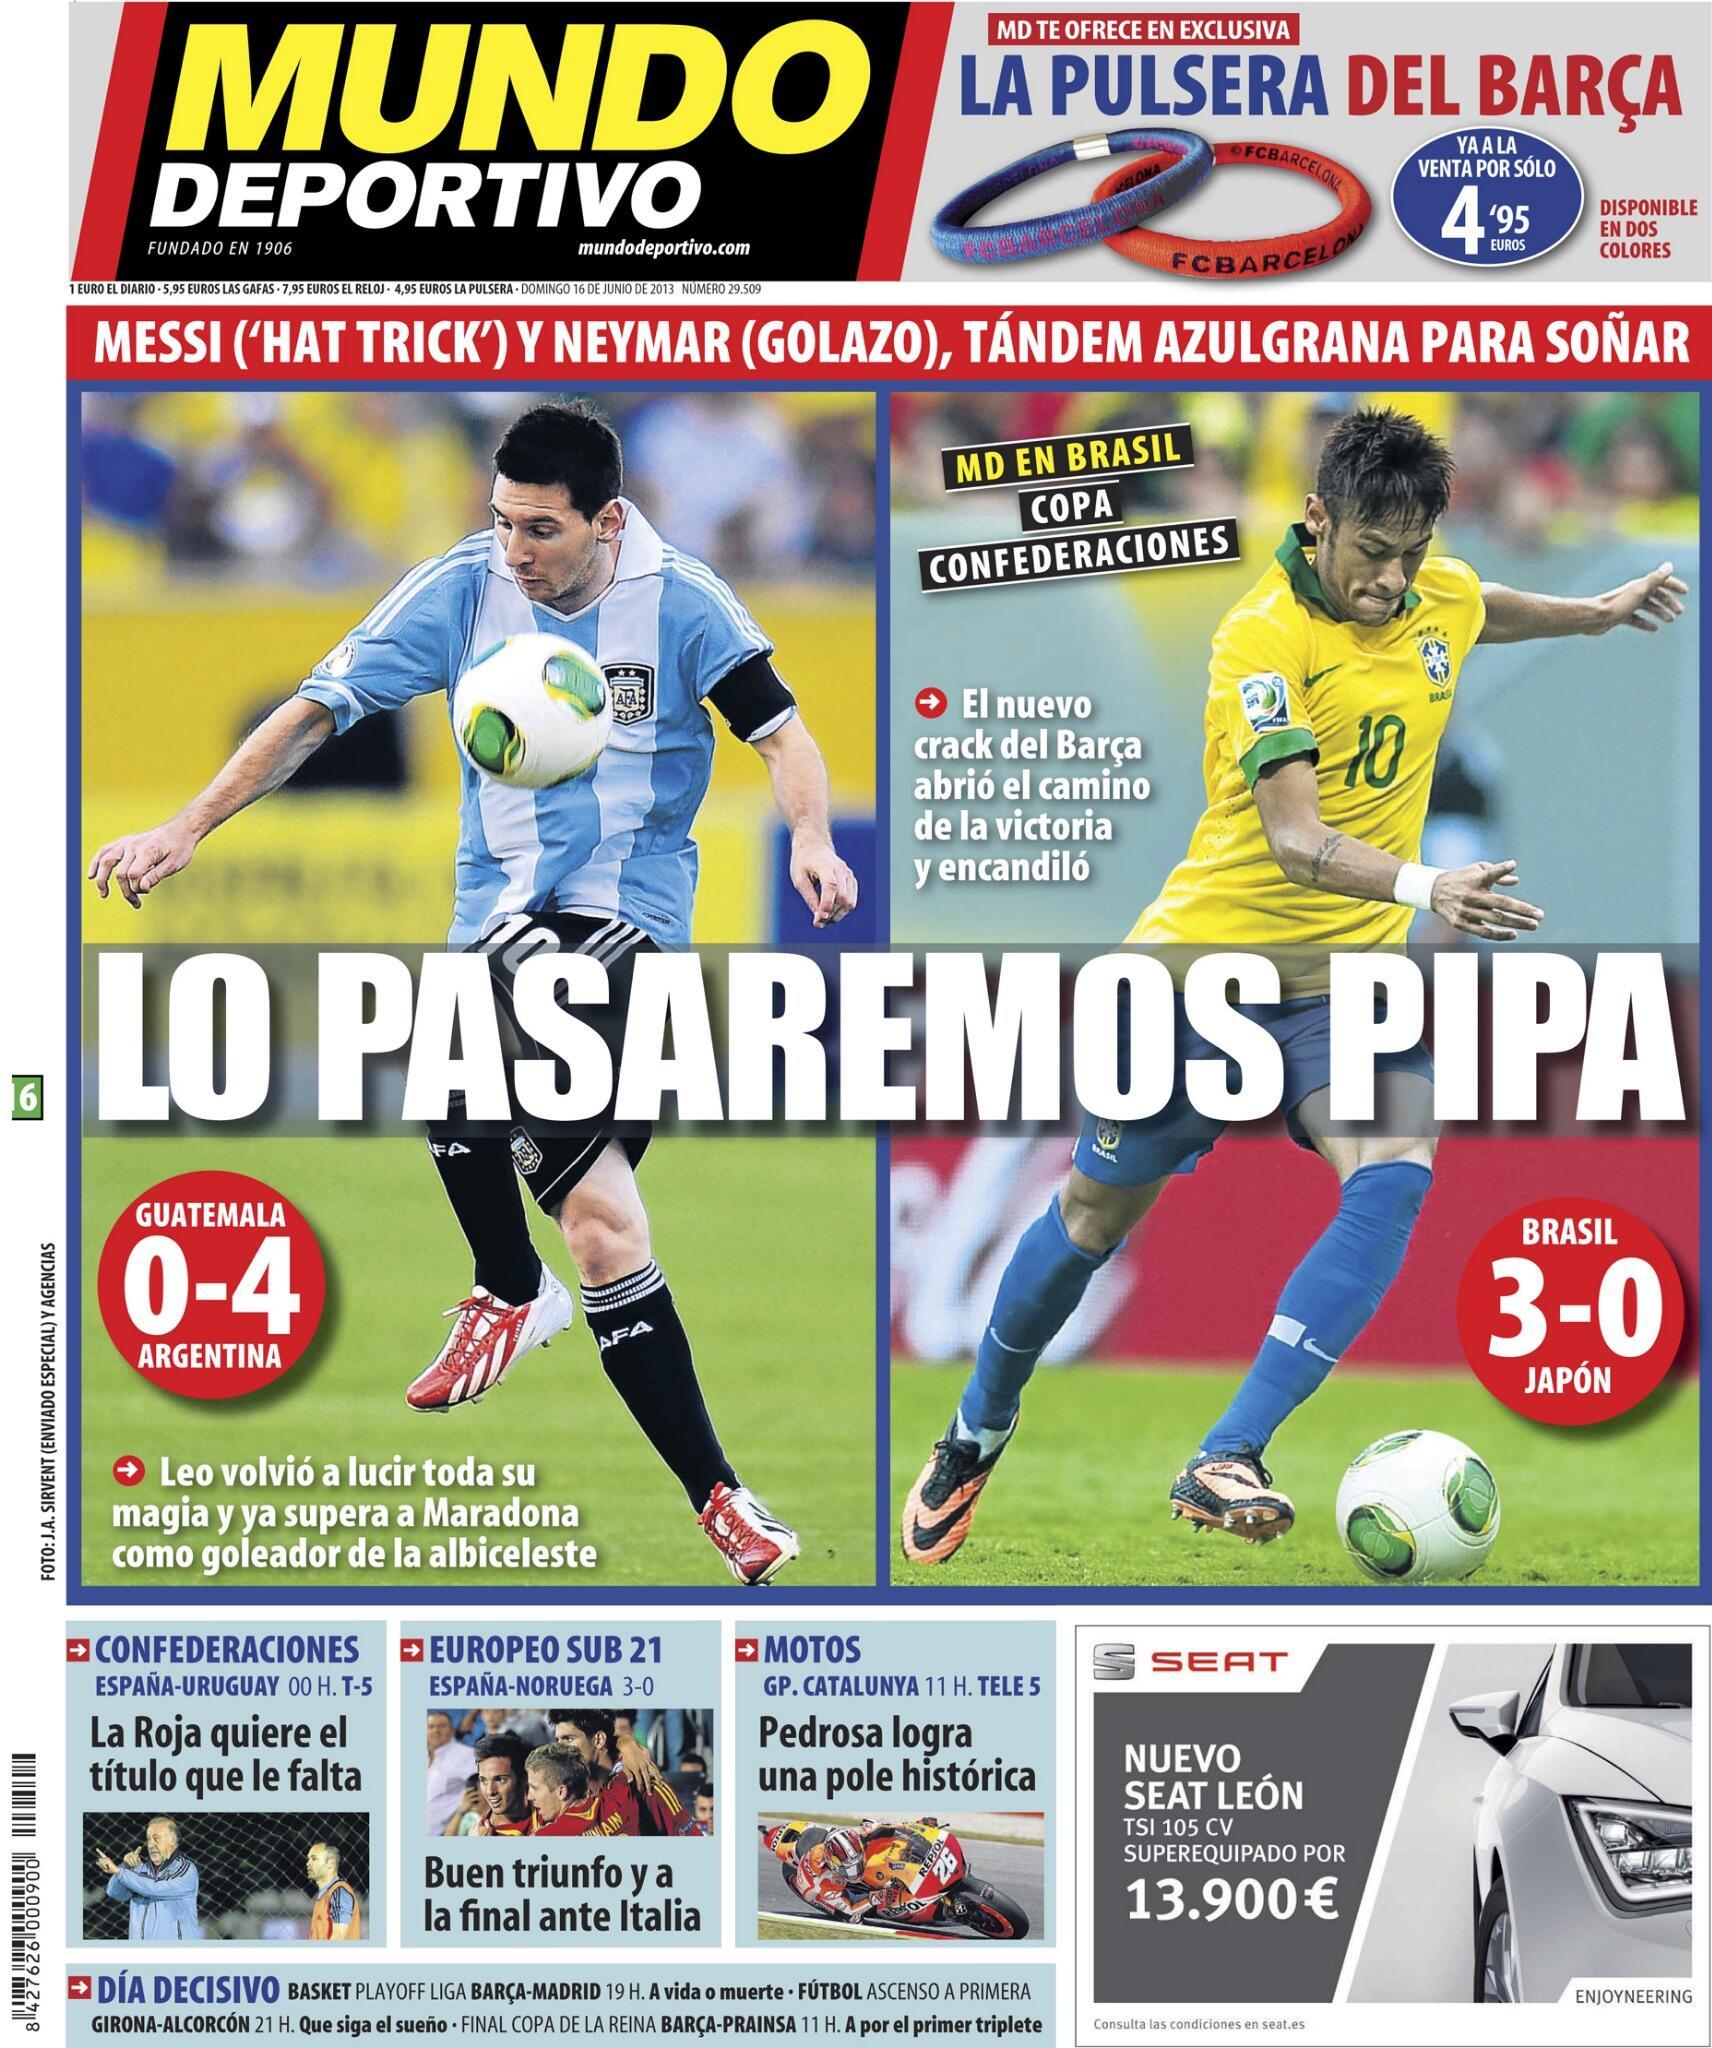 Neymar JR: O Galo do Barça - Page 2 BM1fF2pCAAEFMBX